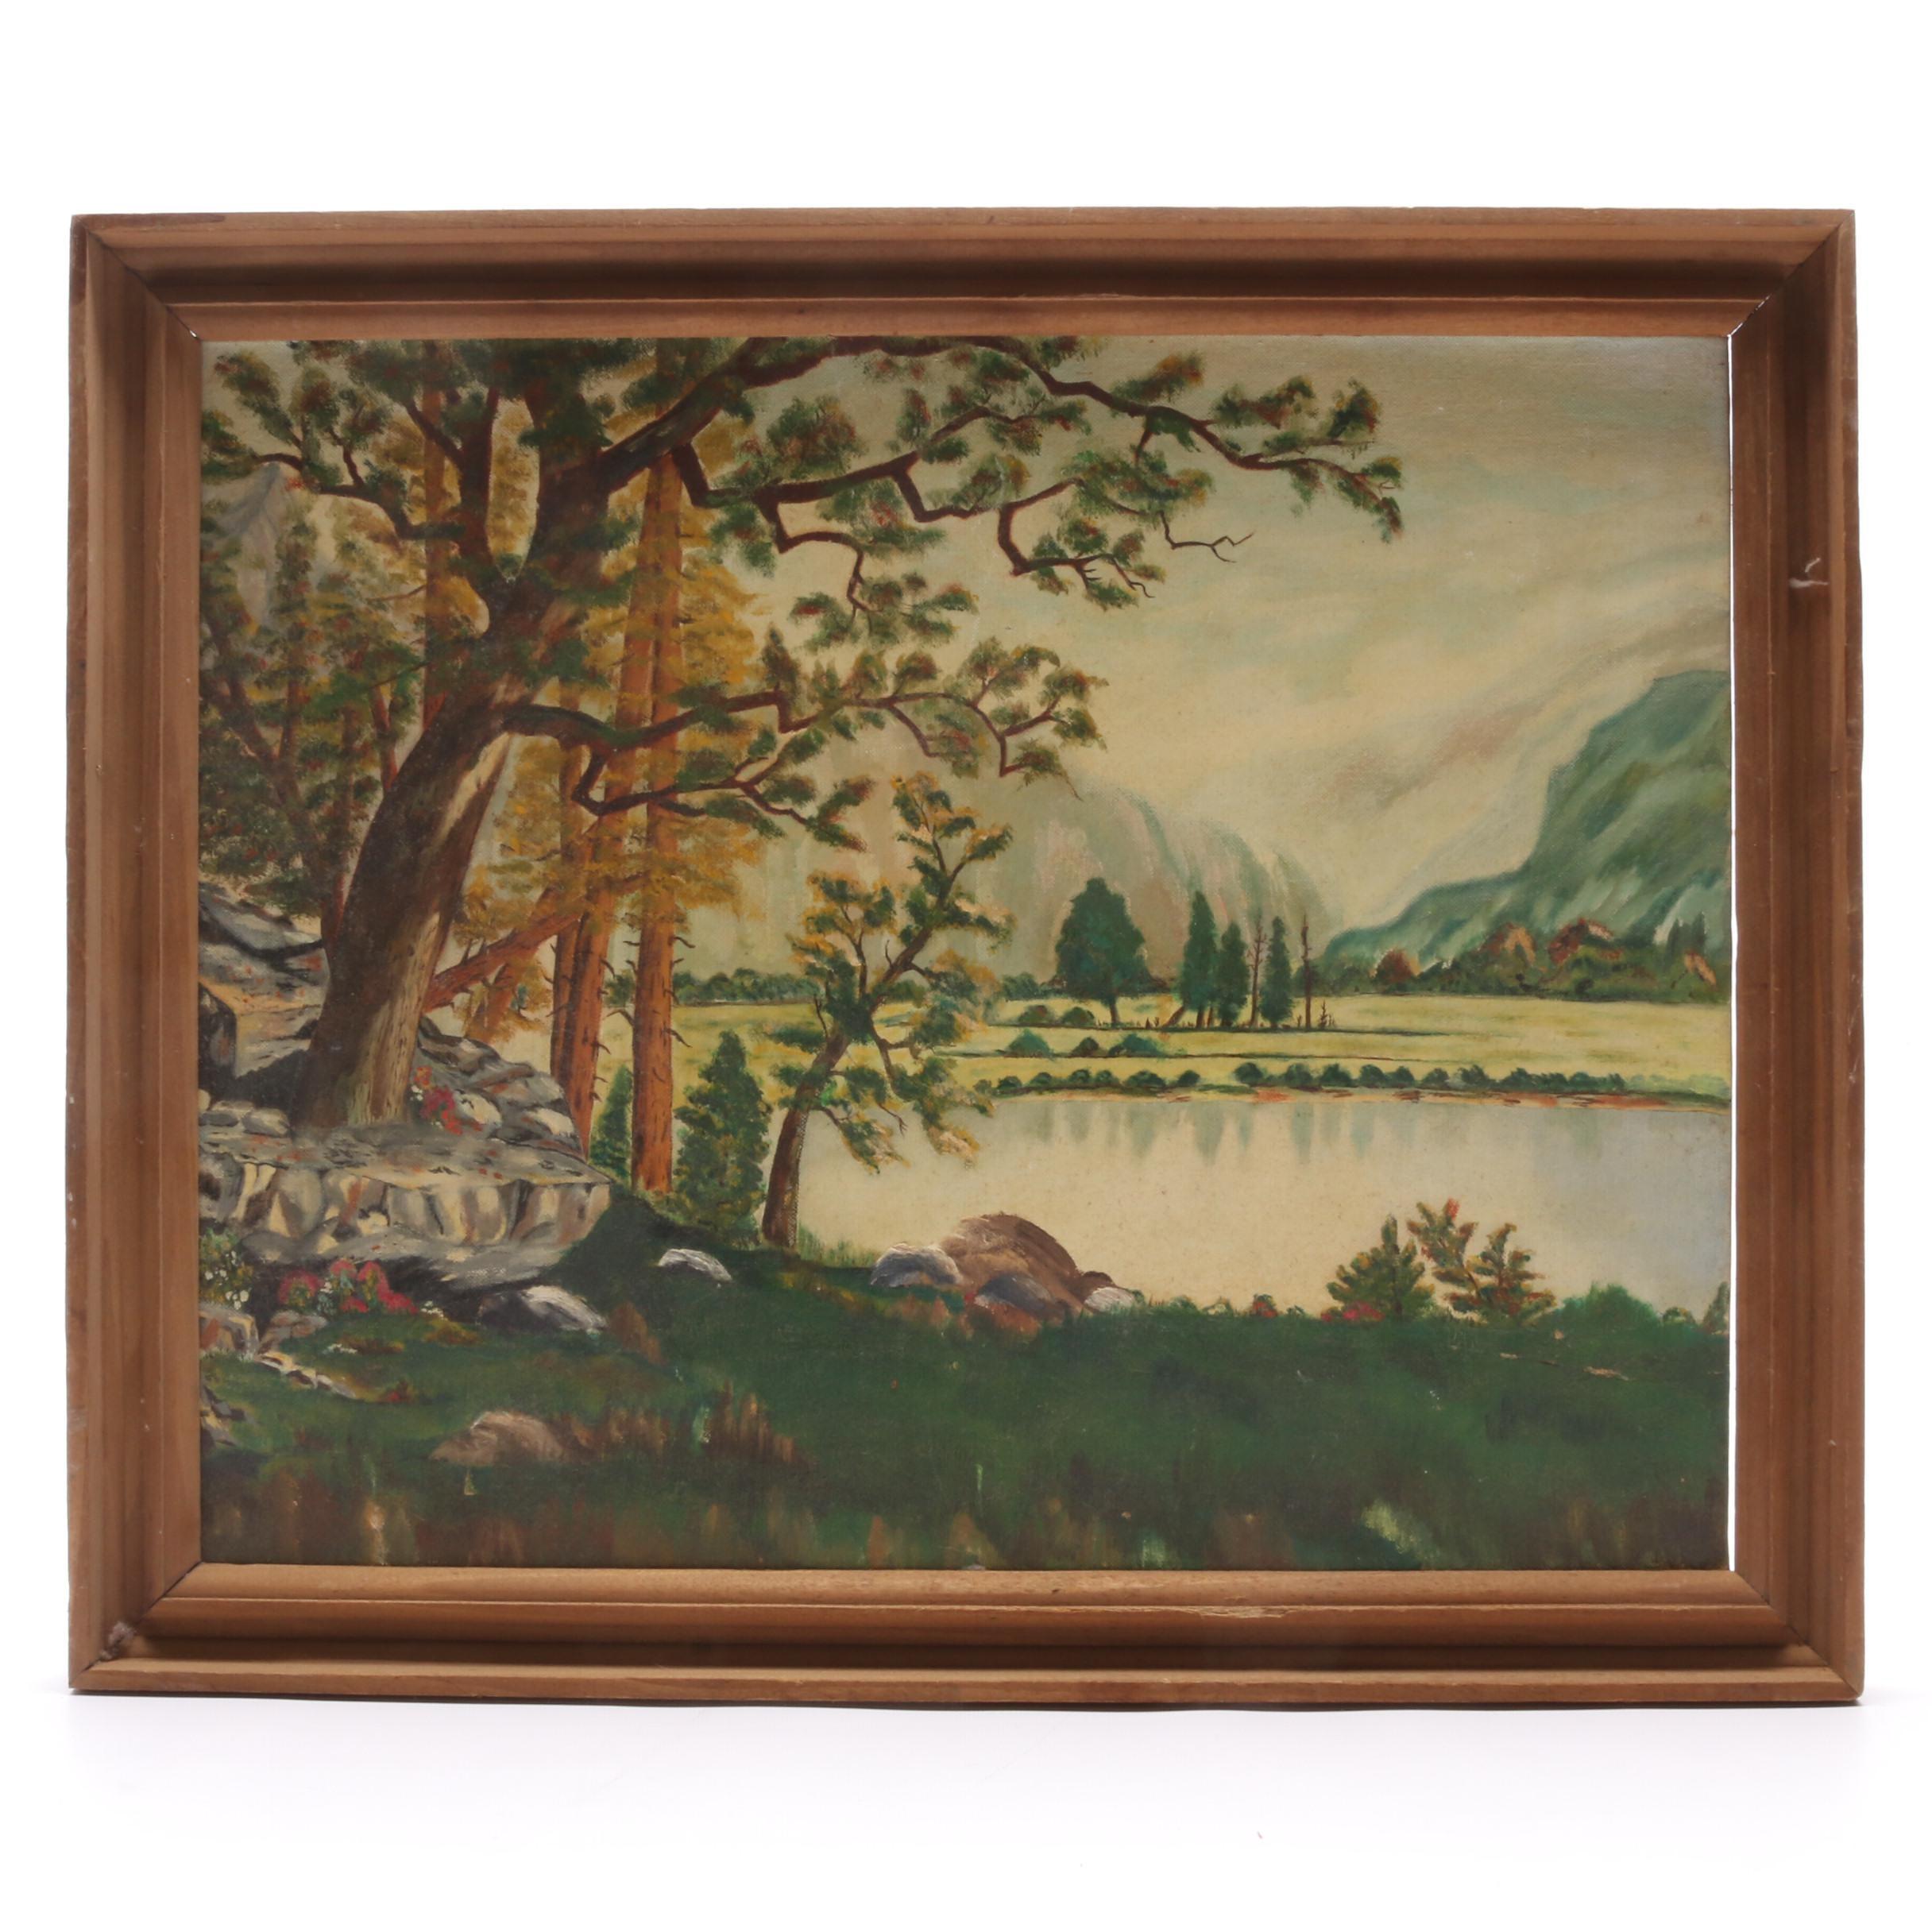 Vintage Naive Style Landscape Oil Painting